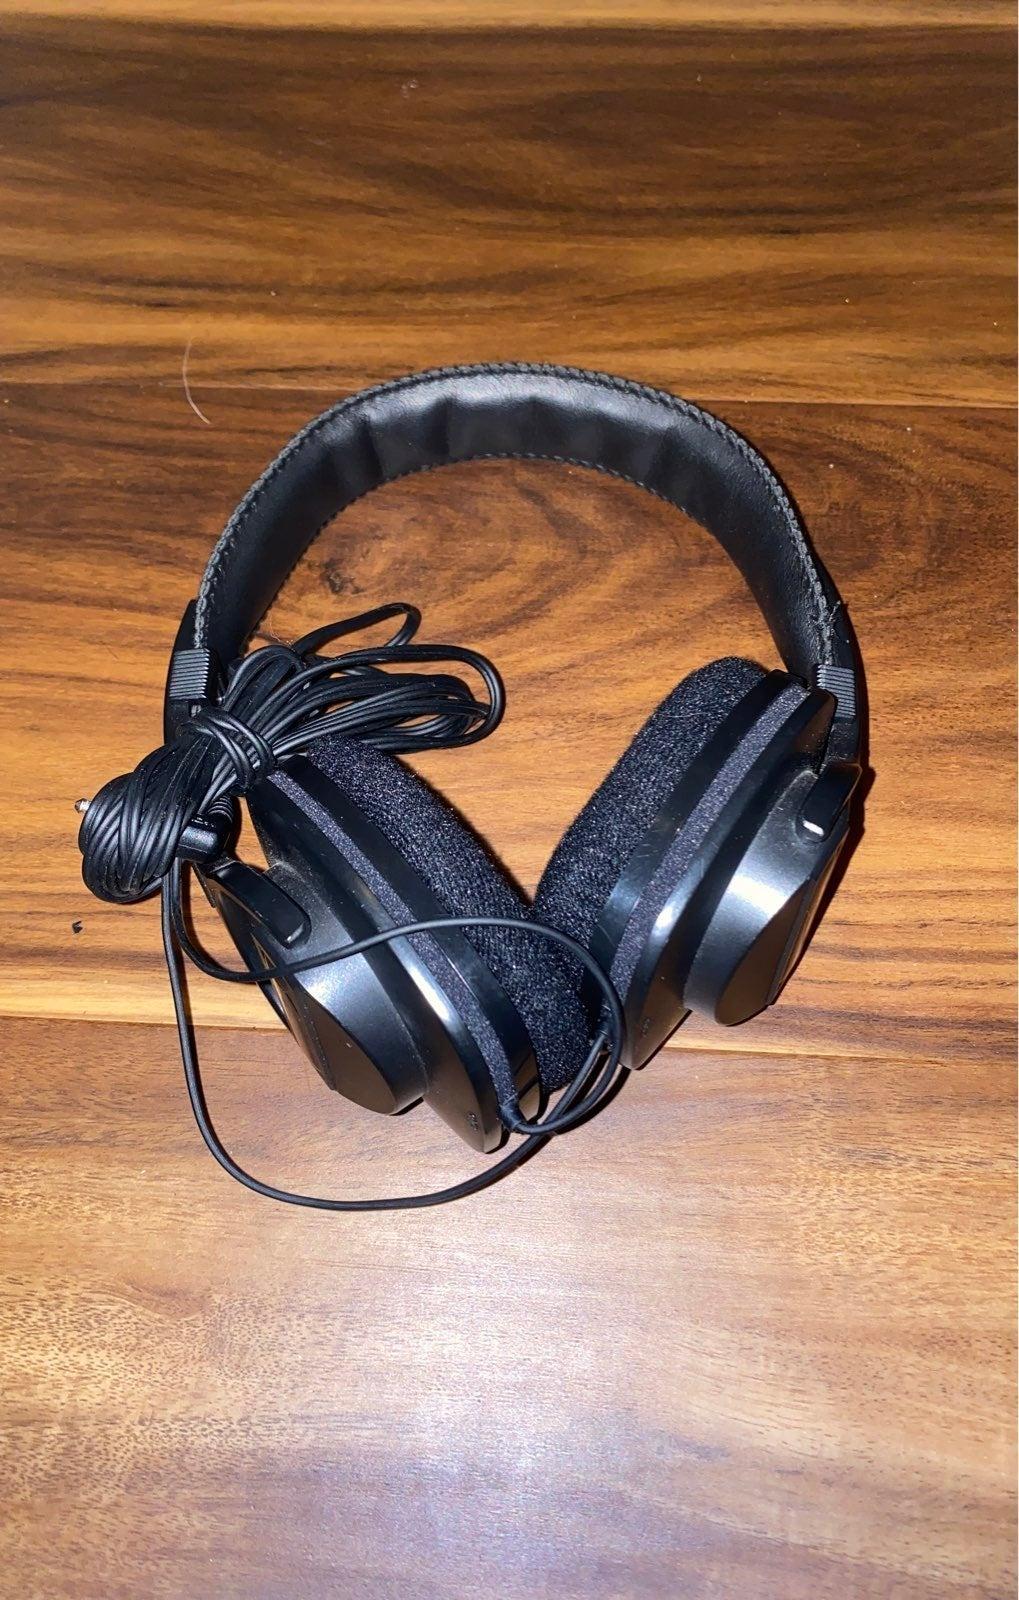 Koss TD/60 headphones